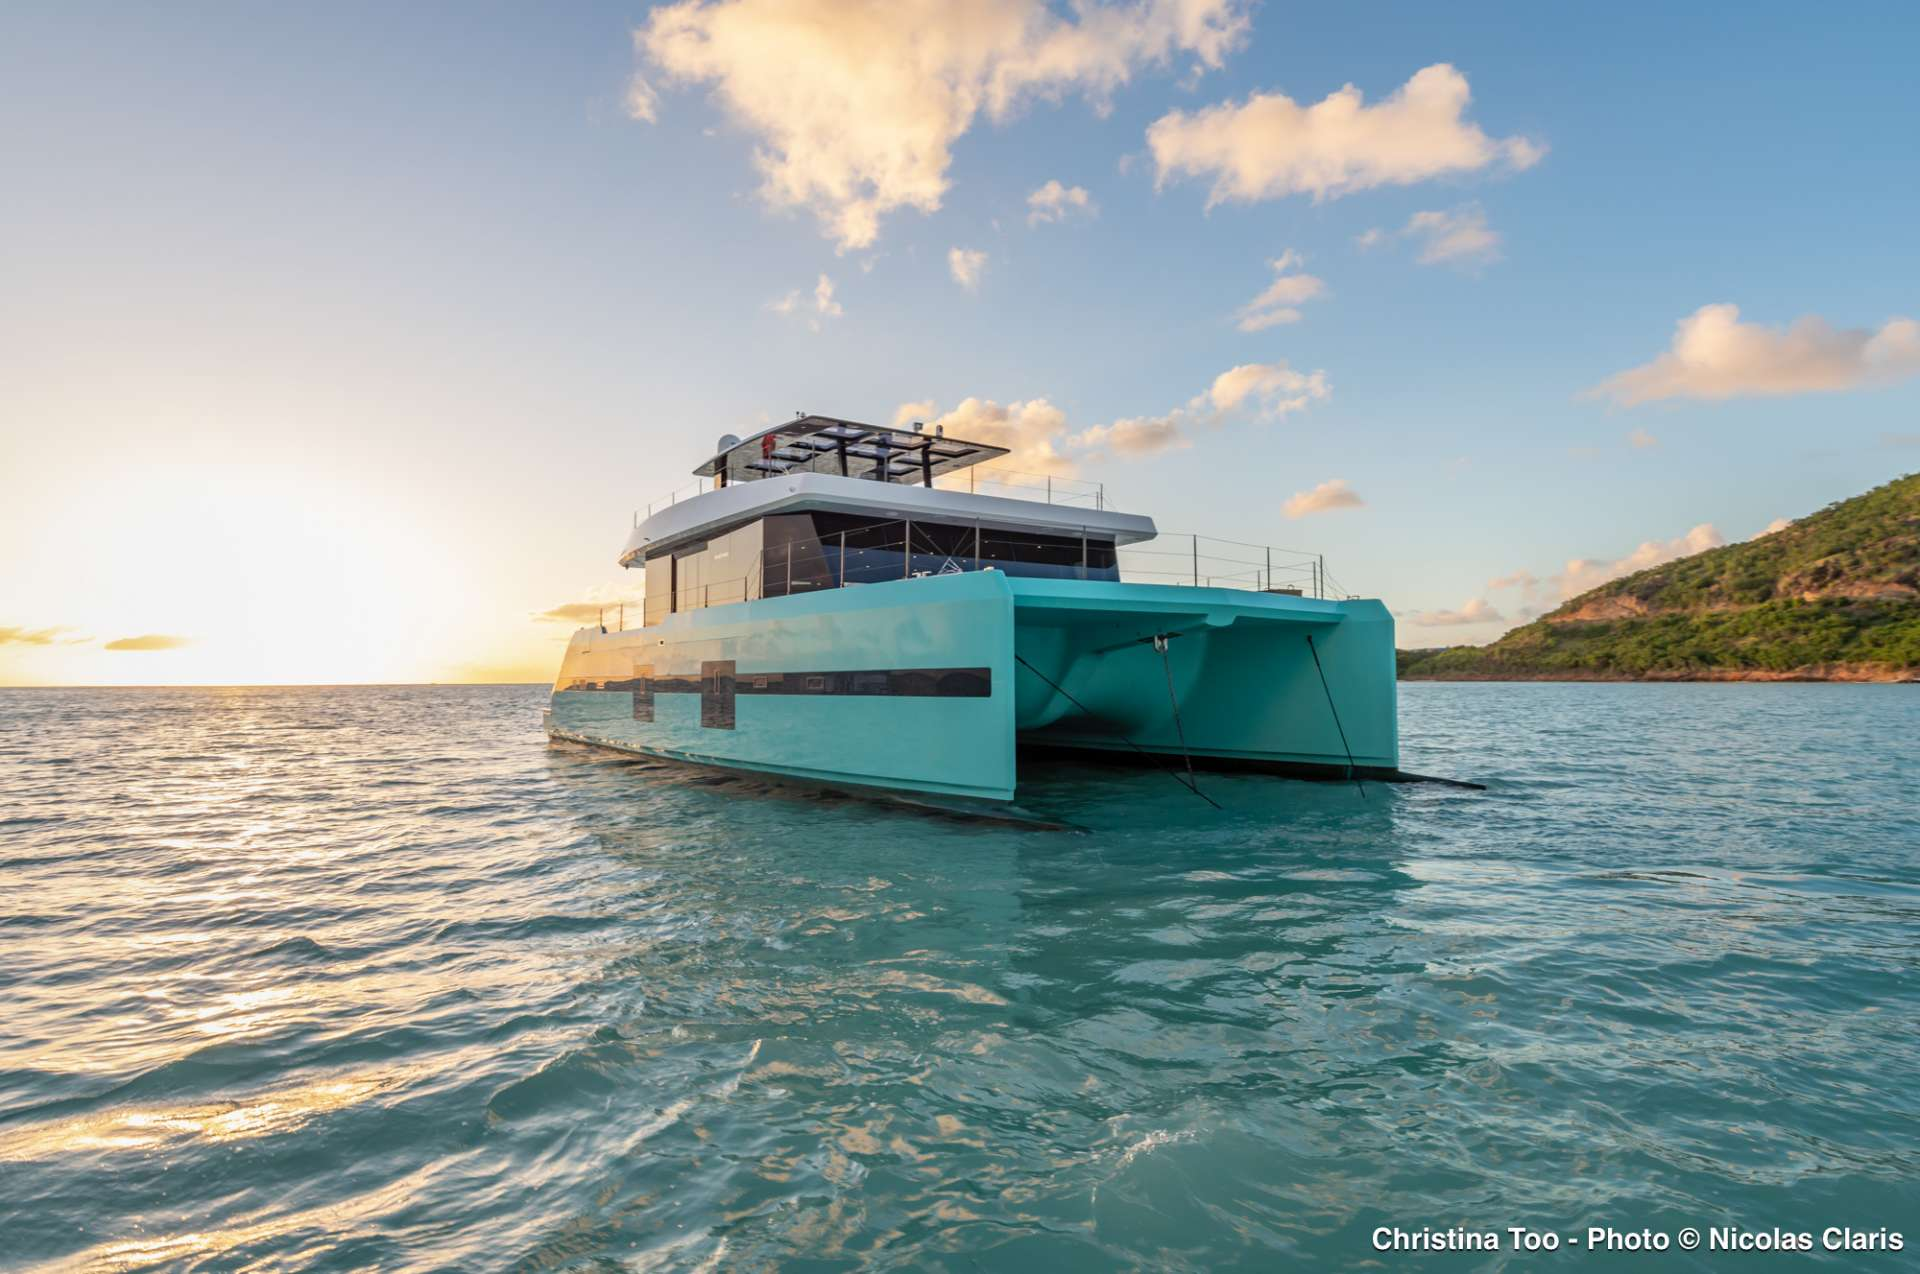 Main image of CHRISTINA TOO yacht